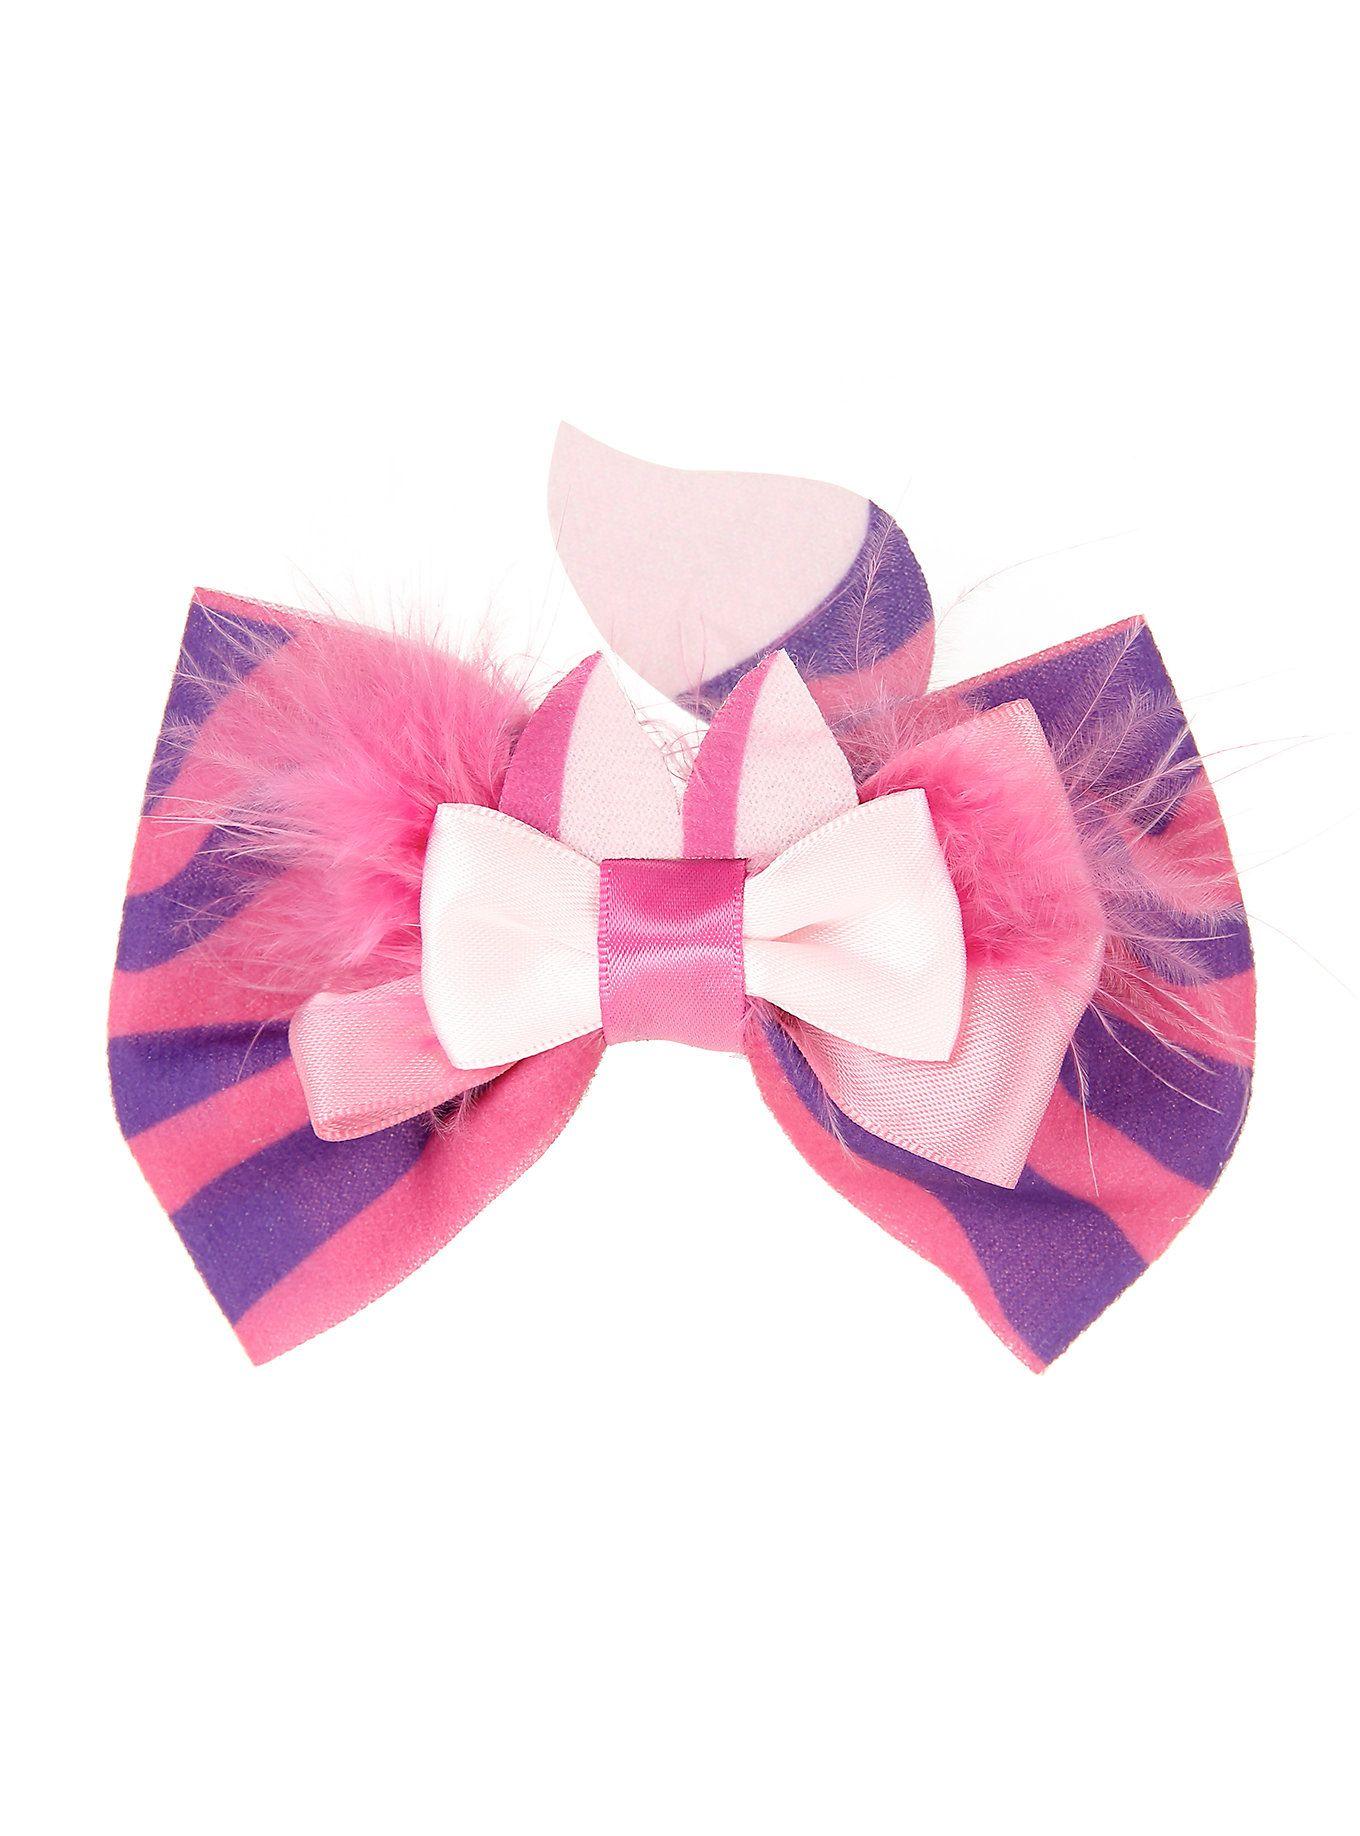 Disney Alice In Wonderland Cheshire Cat Cosplay Hair Bow